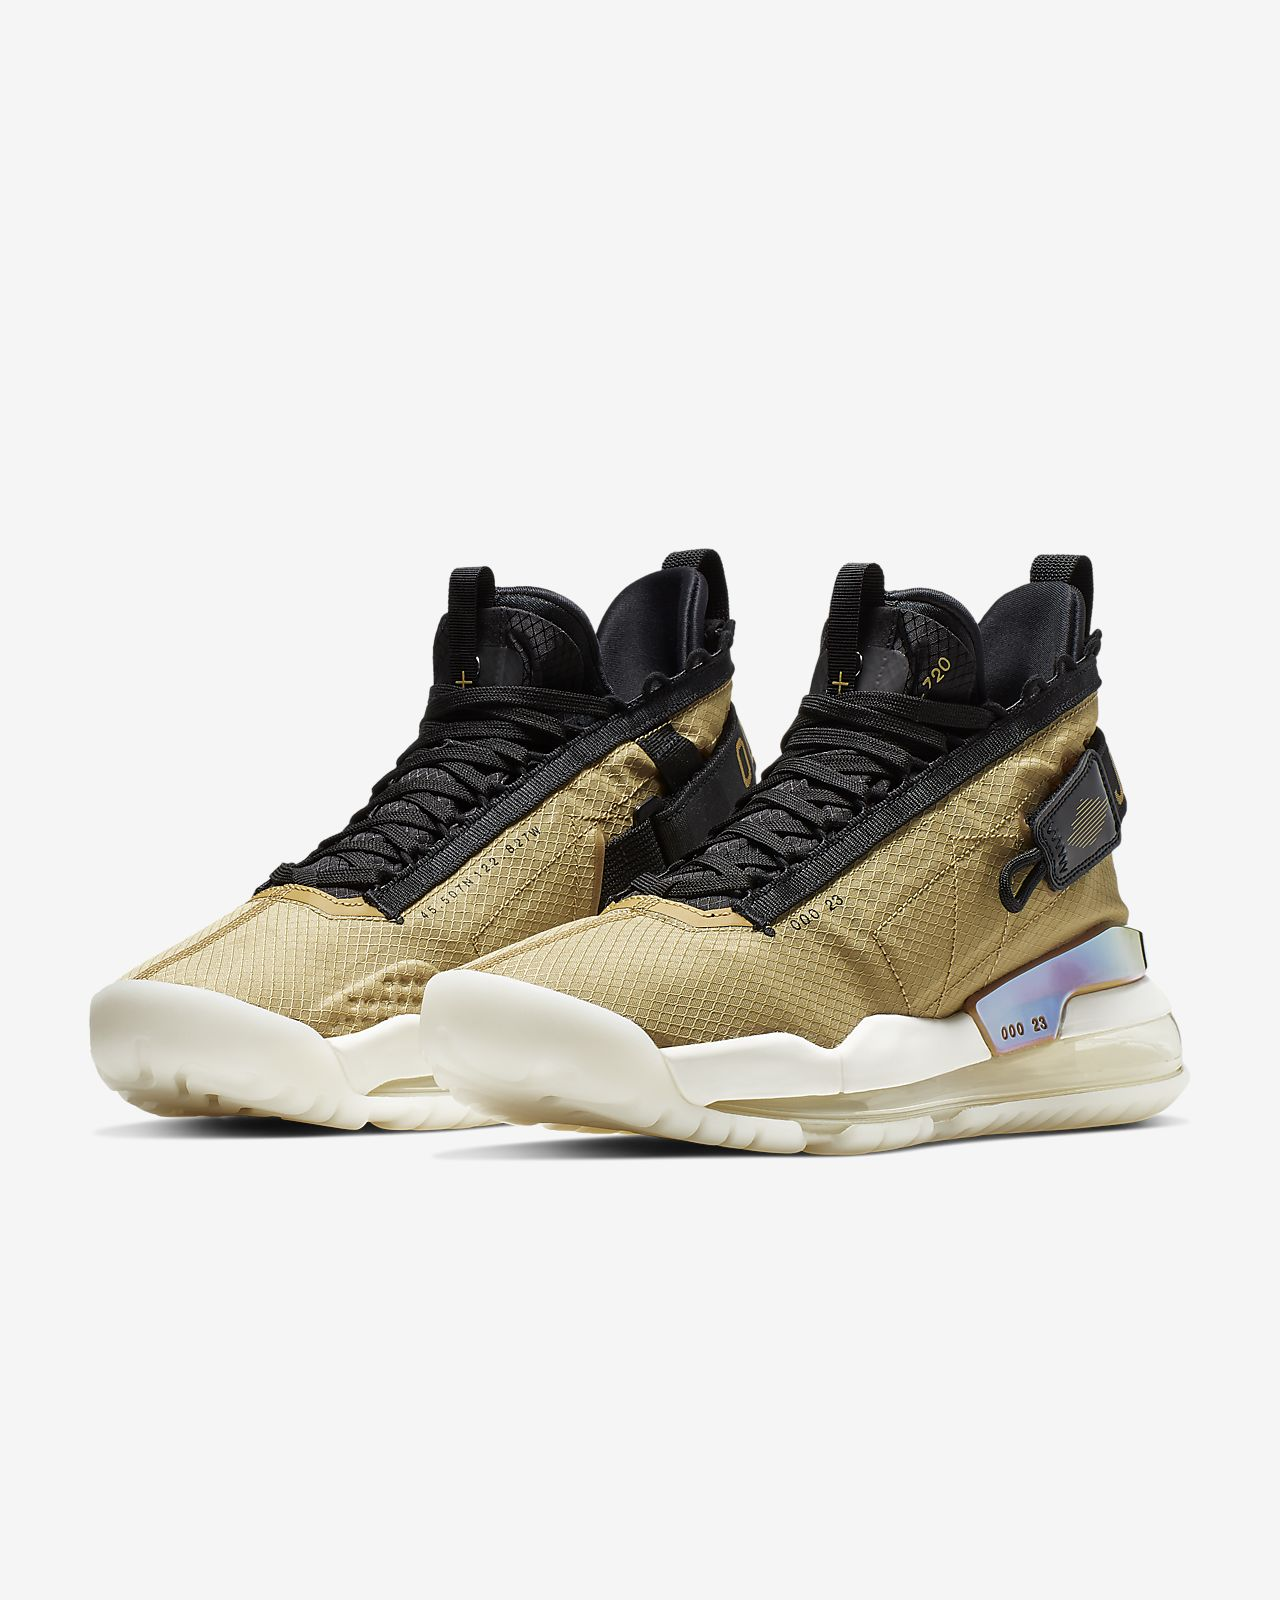 f249368534 Calzado para hombre Jordan Proto-Max 720. Nike.com CL